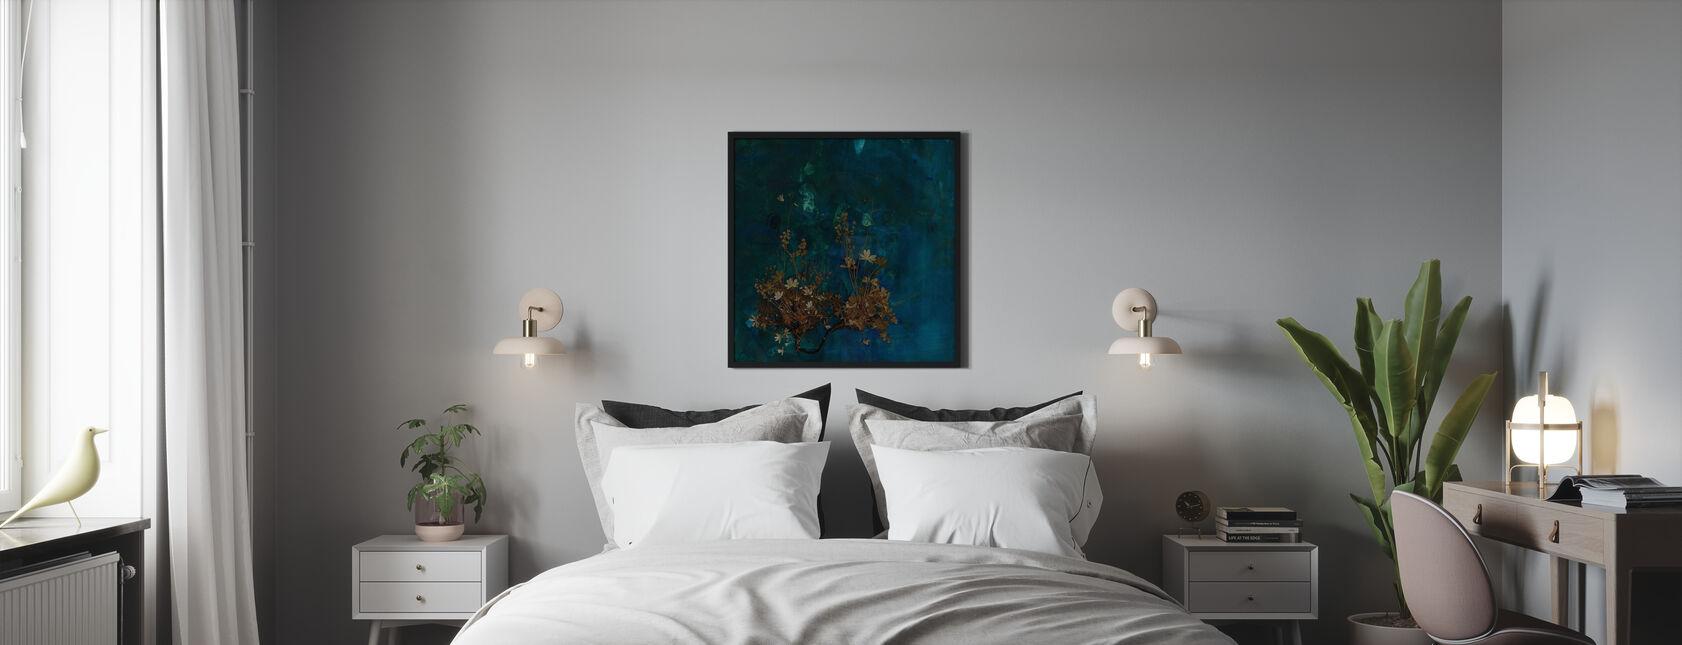 Plateau - Poster - Bedroom